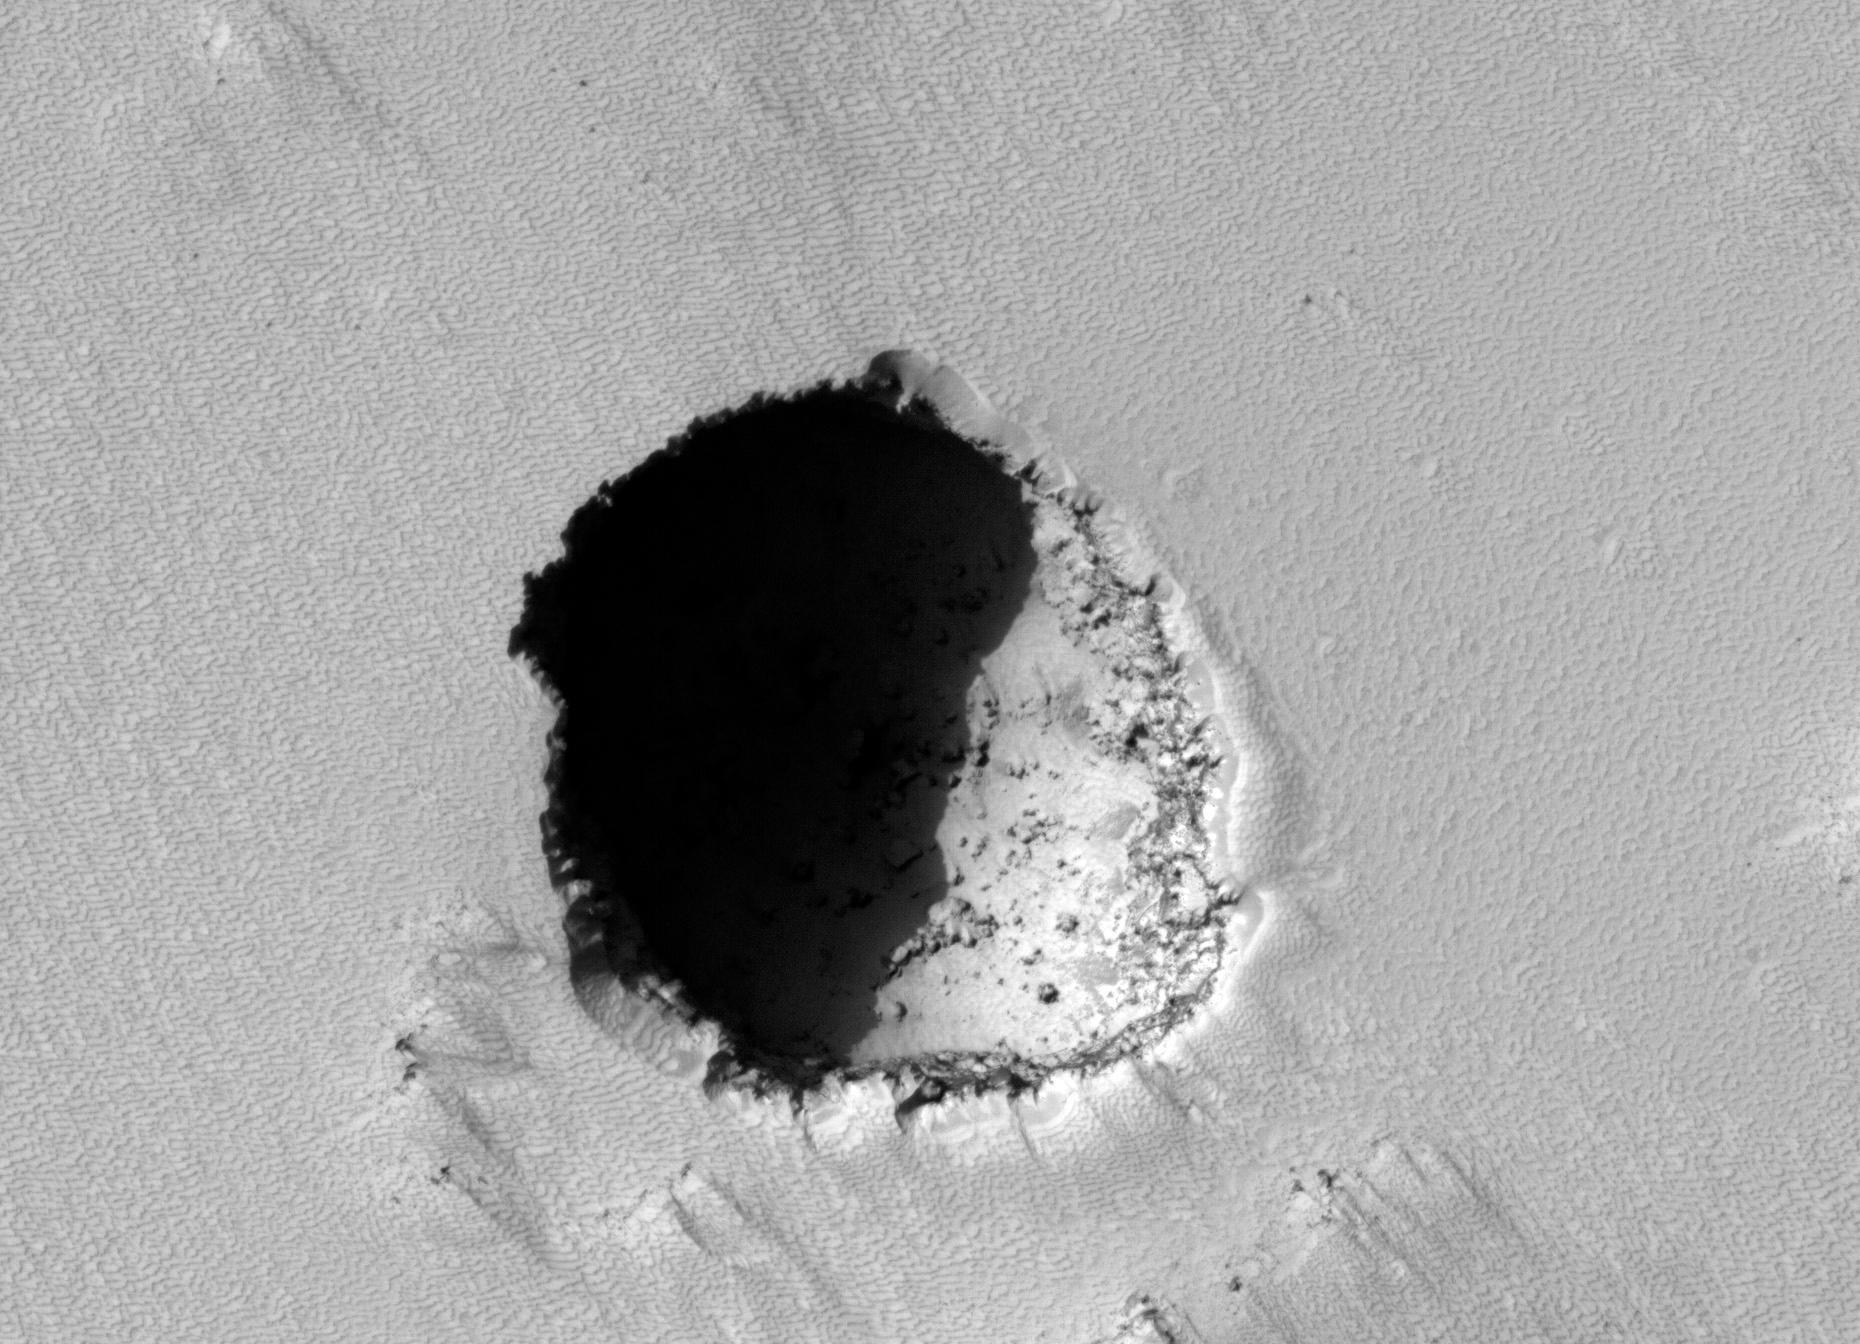 200-yard-wide pit on Mars